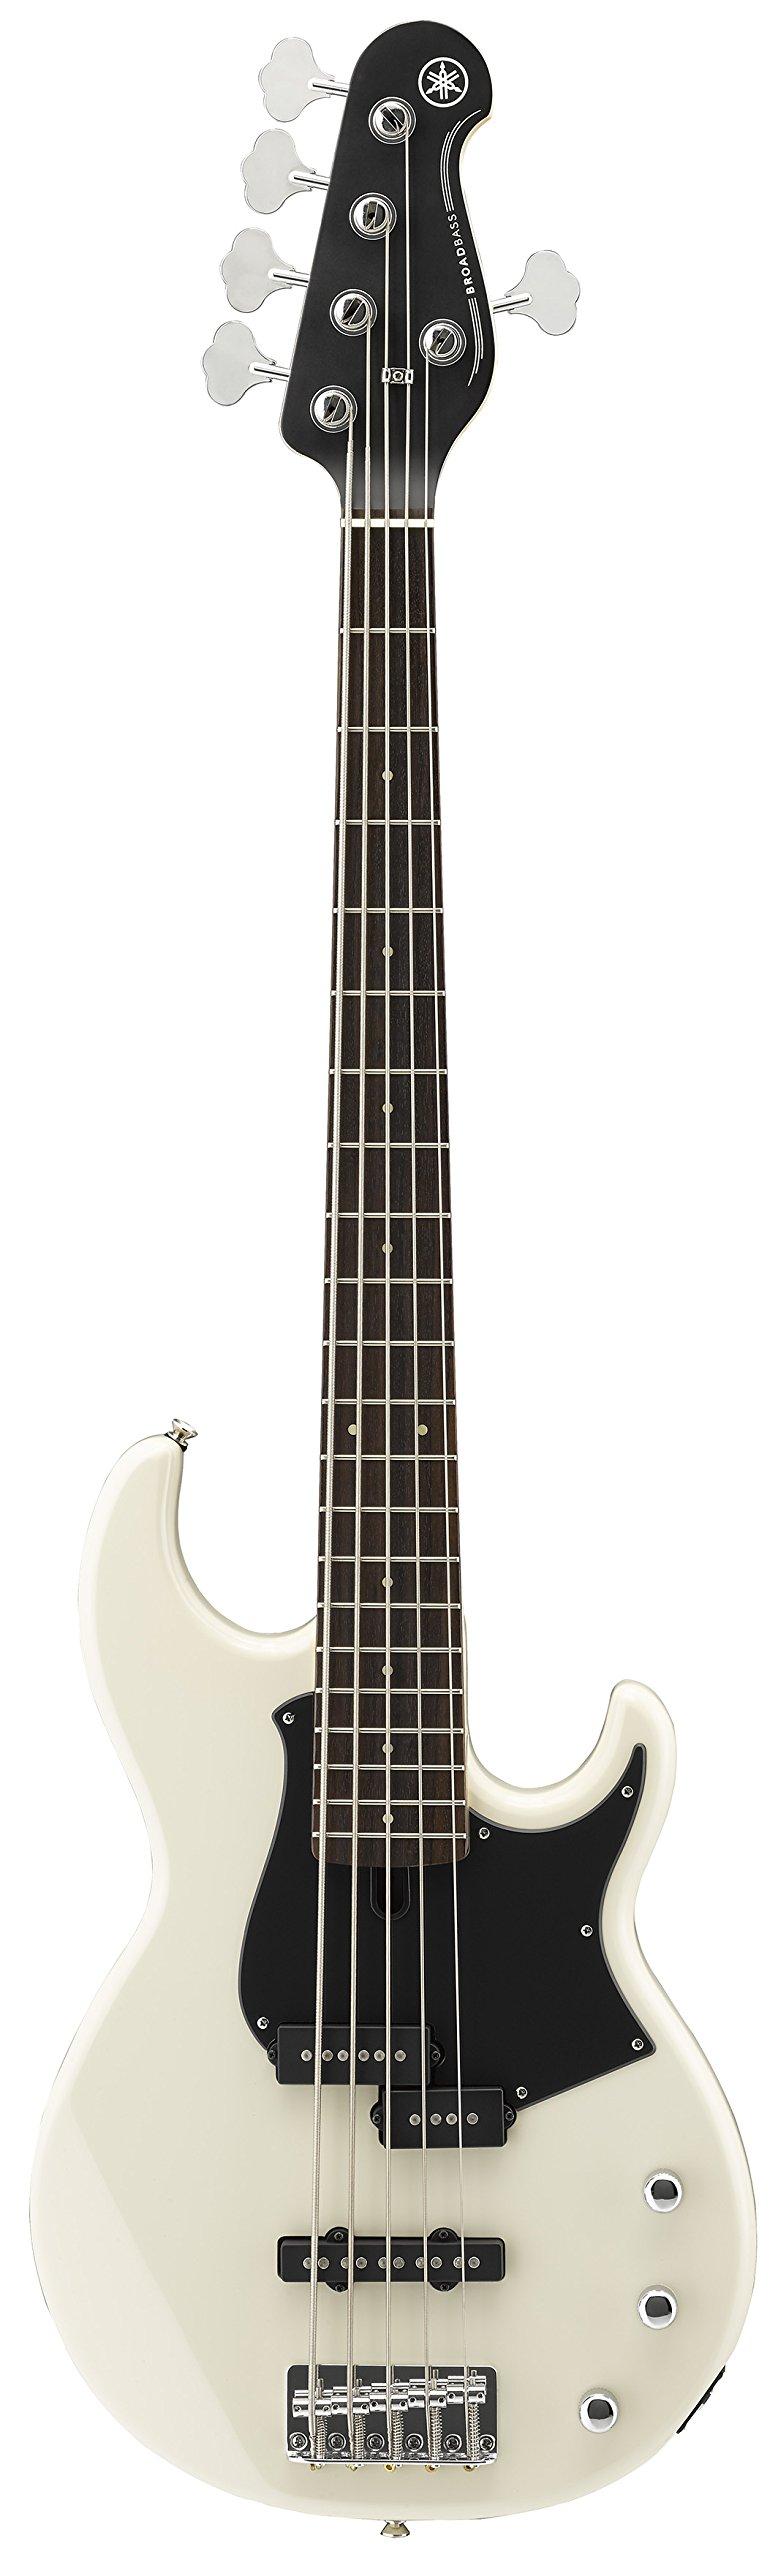 Yamaha BB235 BB-Series 5-String Bass Guitar, Vintage White